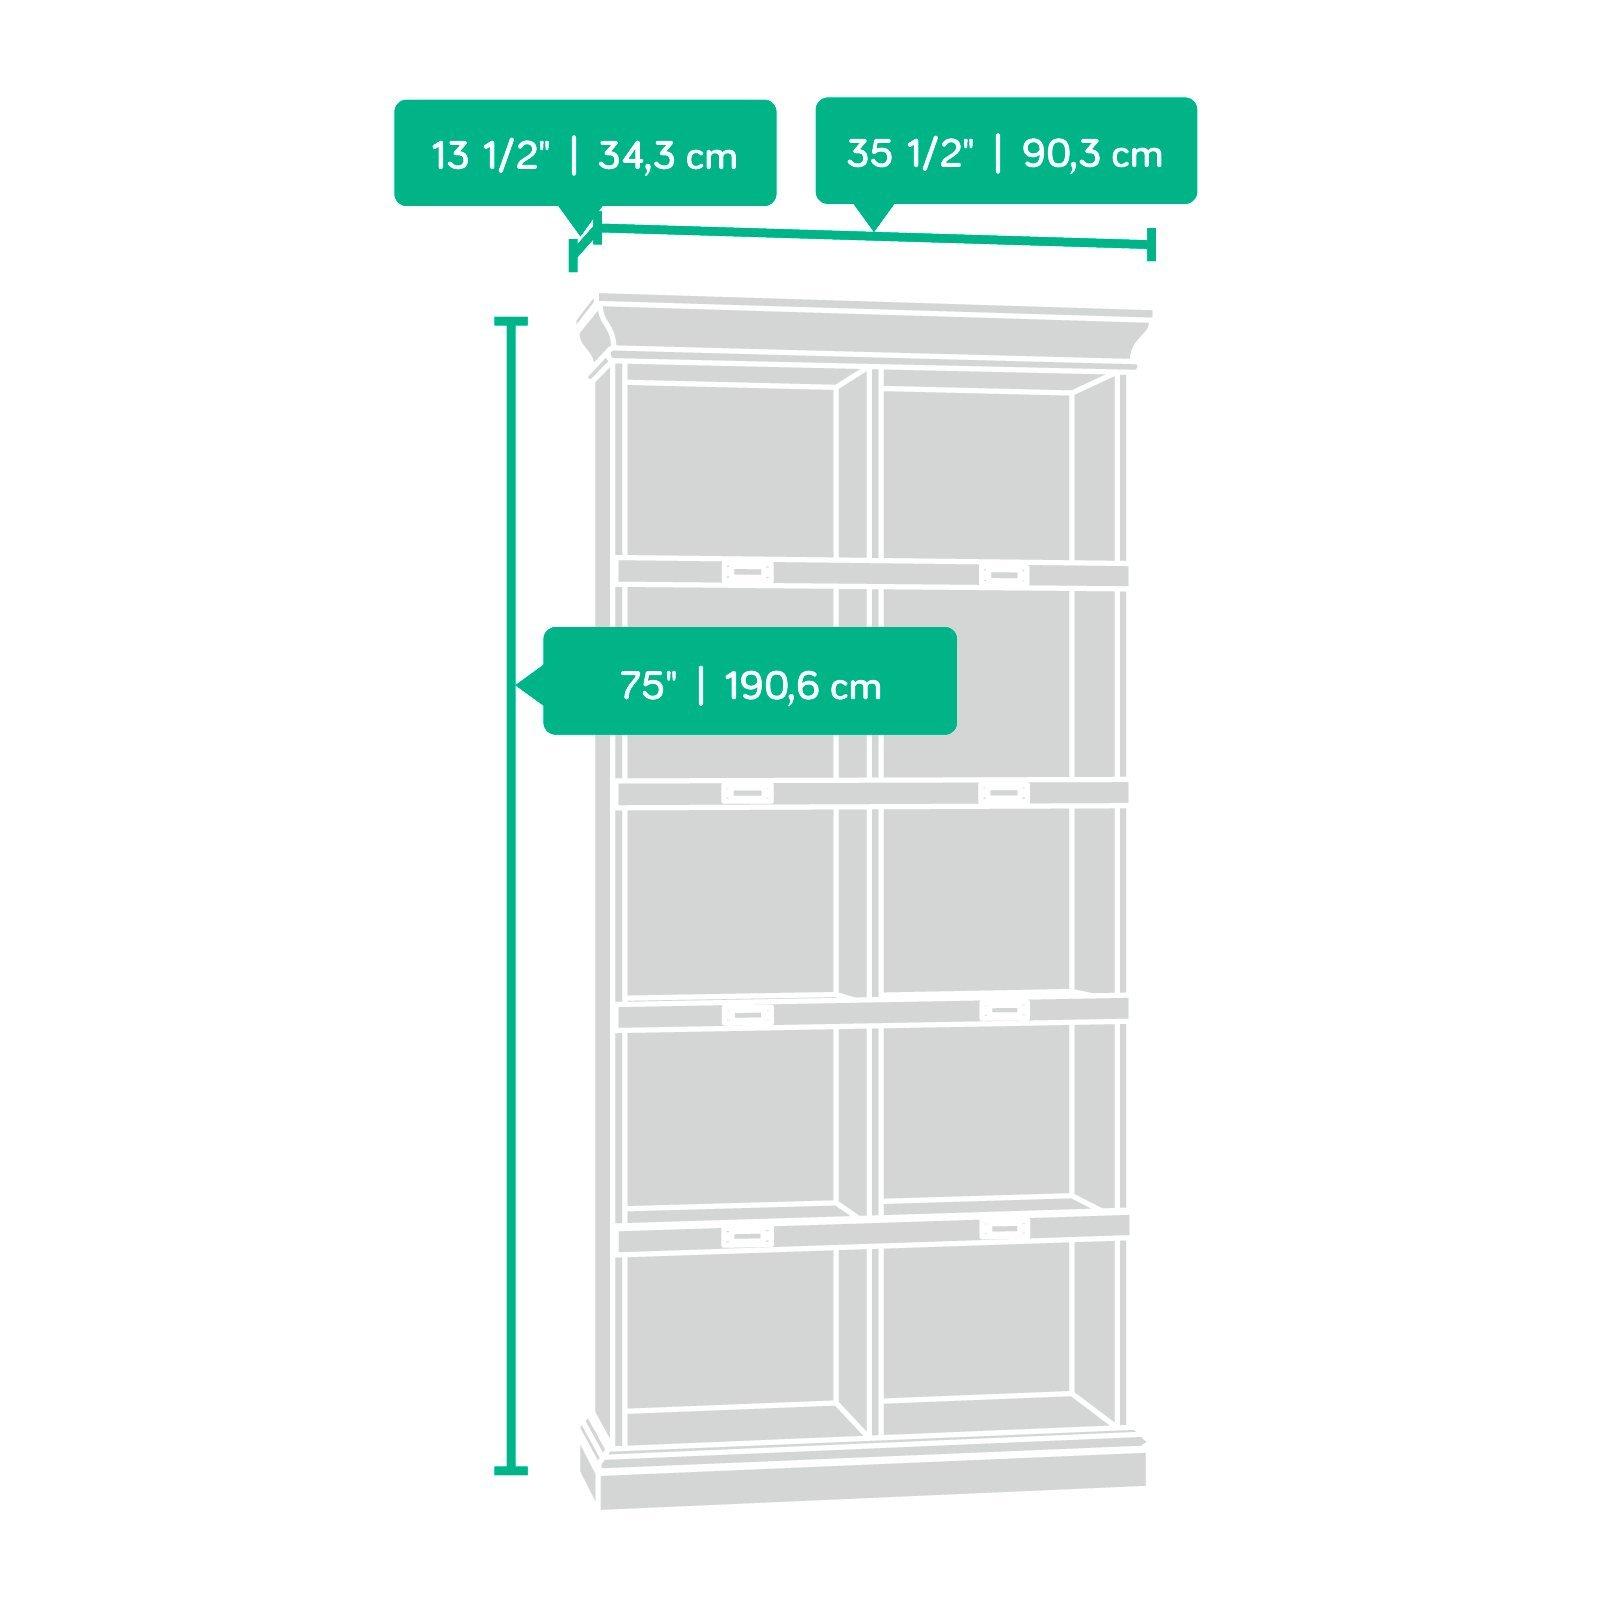 Sauder 414725 Barrister Lane Bookcase, L: 35.55'' x W: 13.50'' x H: 75.04'', Scribed Oak finish by Sauder (Image #10)